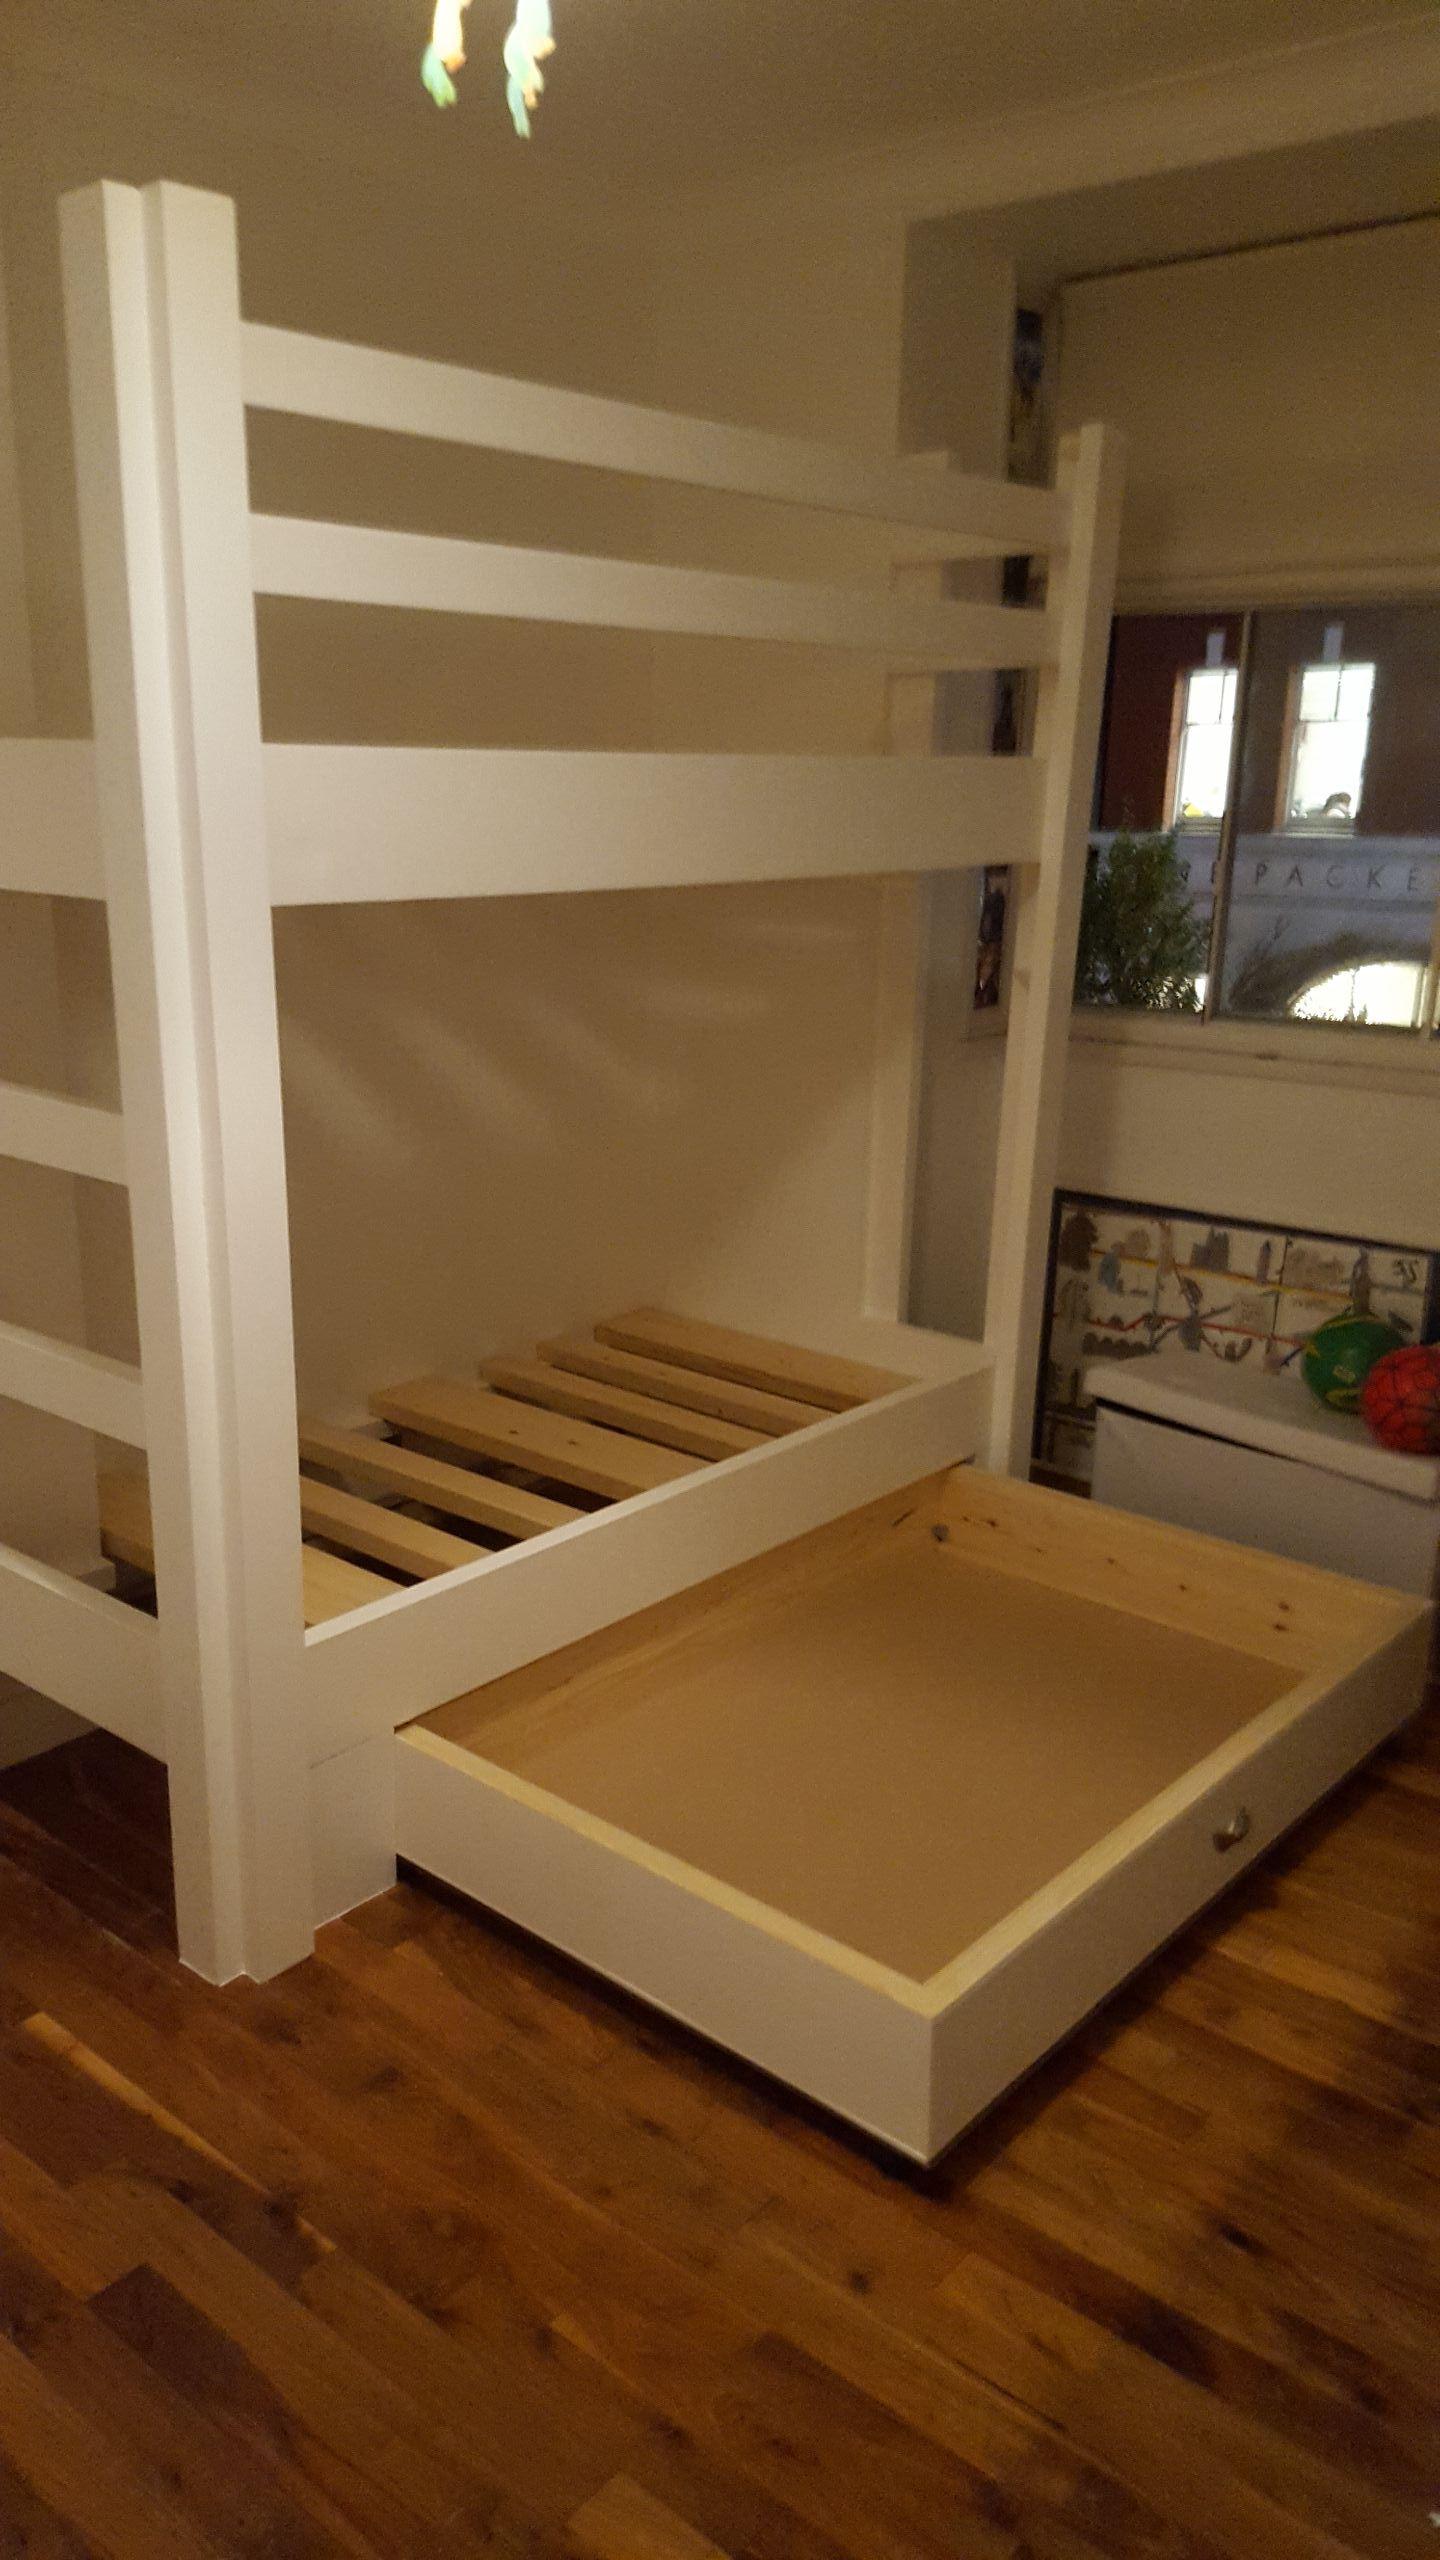 Design Inspiration SOLID WOOD BEDS Custom made beds